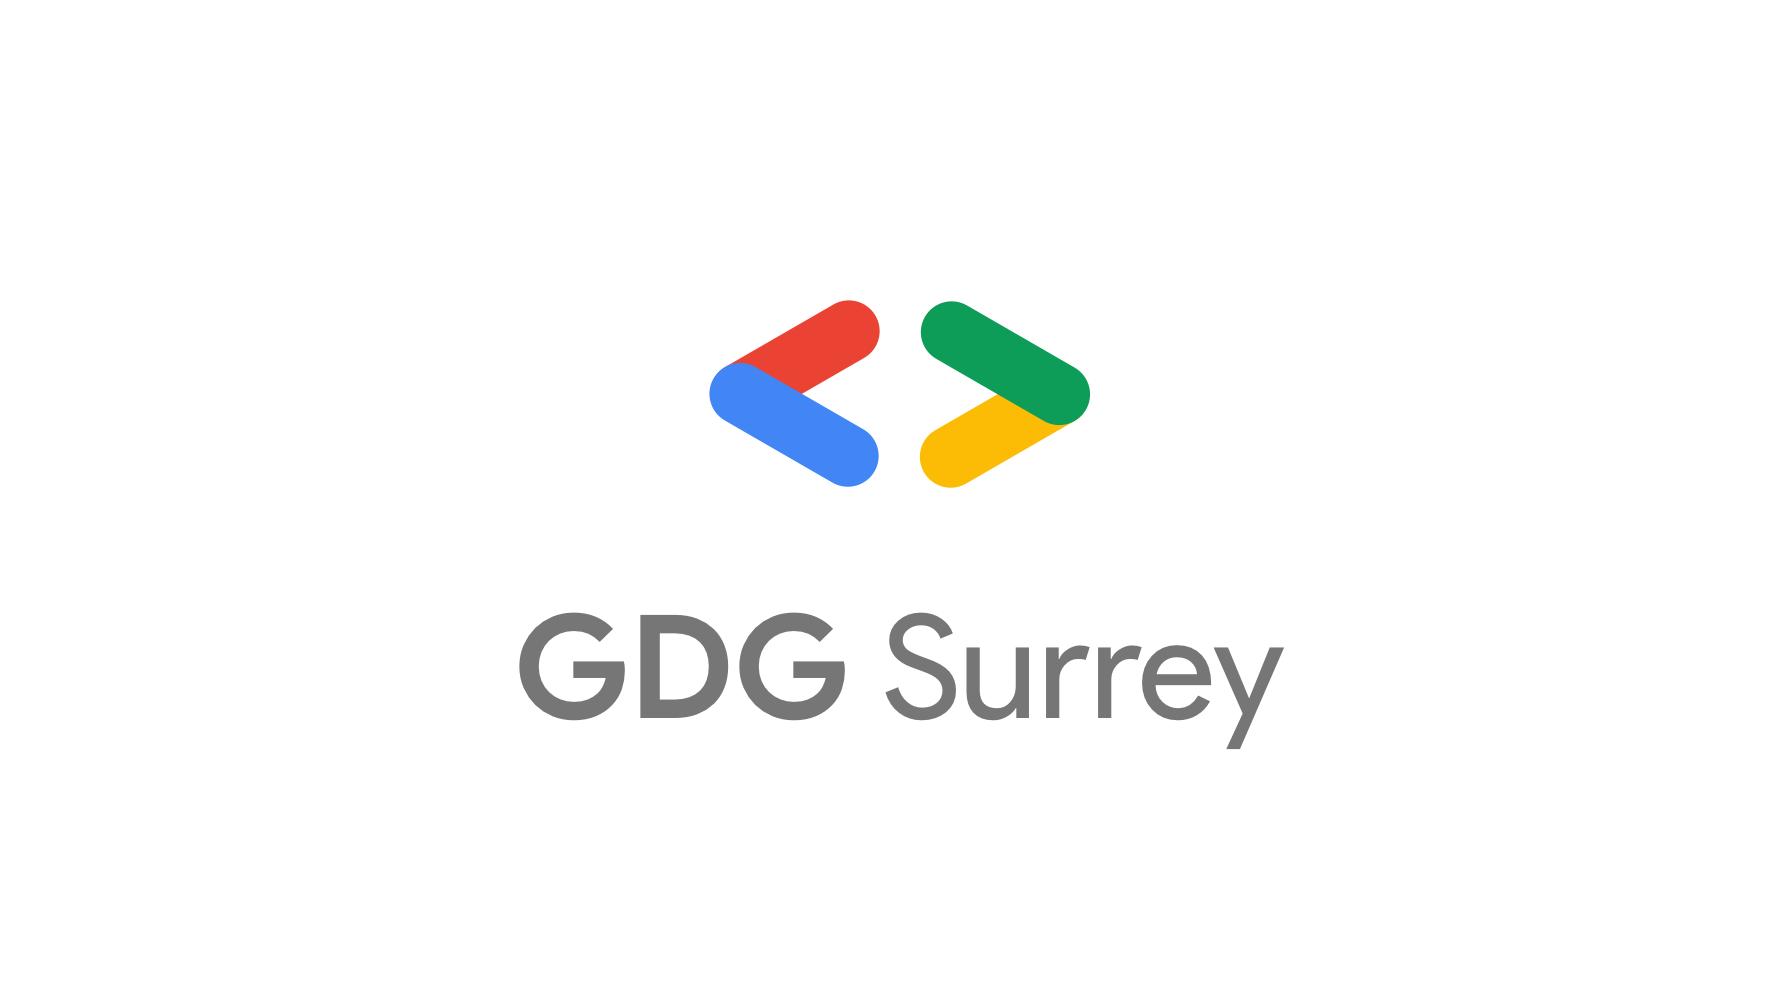 Google Developers Group Surrey